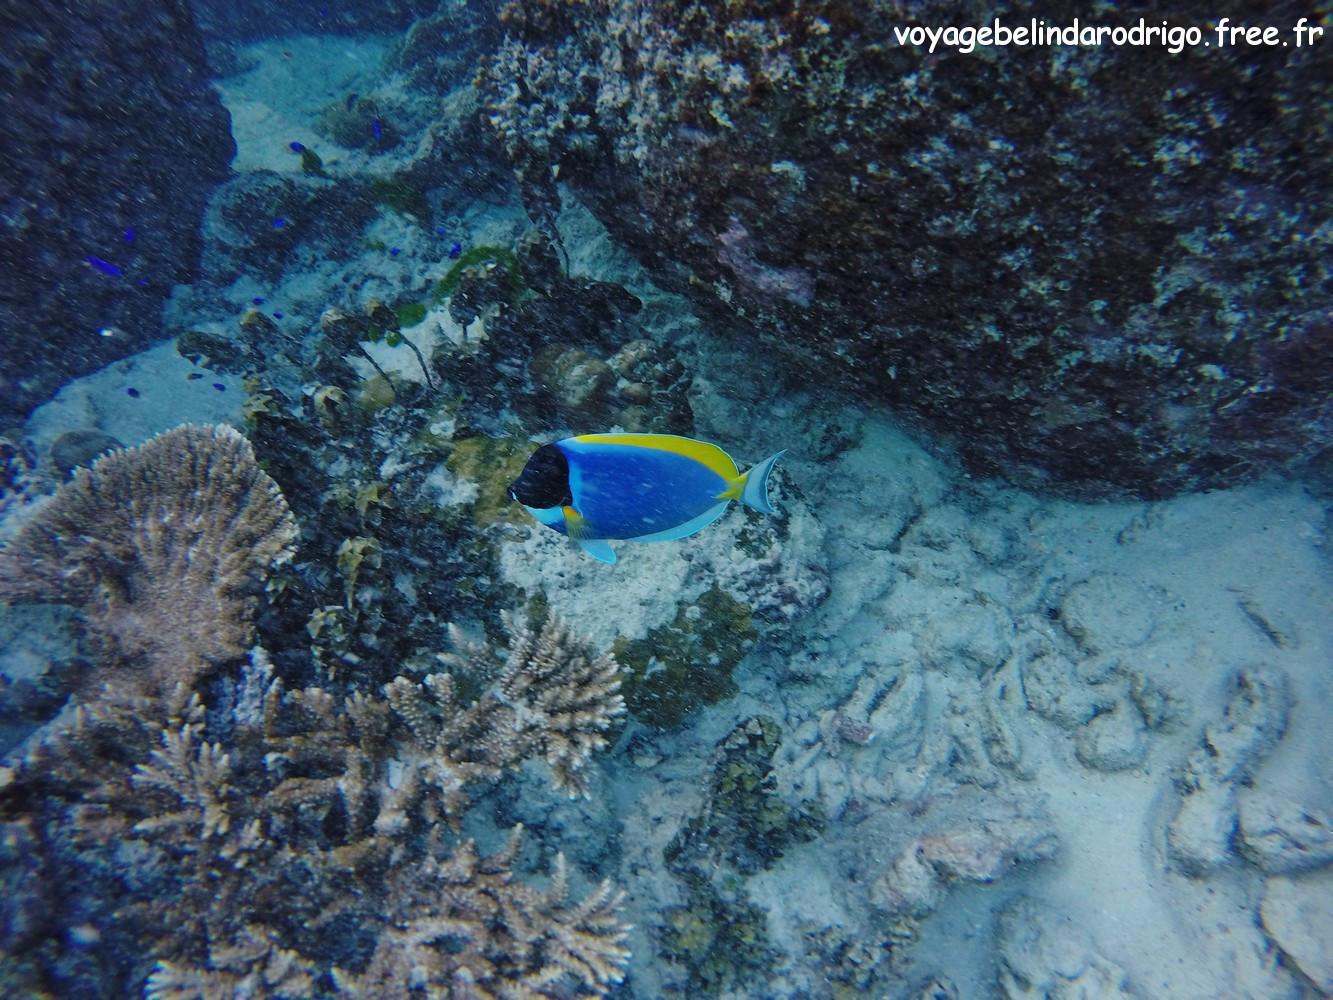 Poisson Chirurgien à poitrine blanche - Snorkeling - Anse Lazio - Praslin